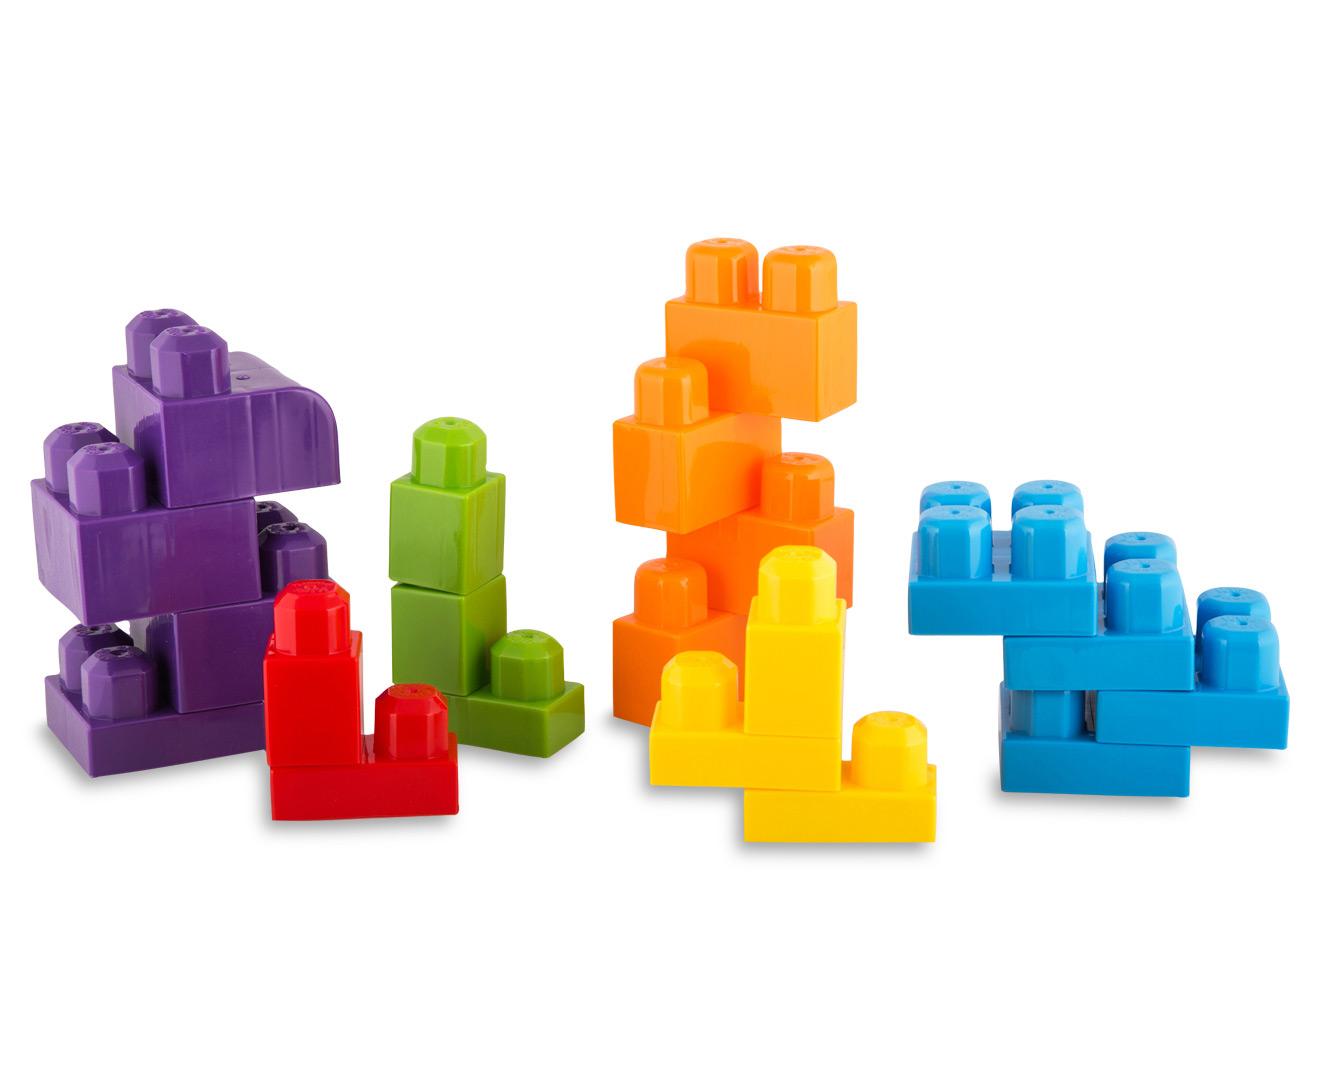 Building Blocks Plastic Stick Together